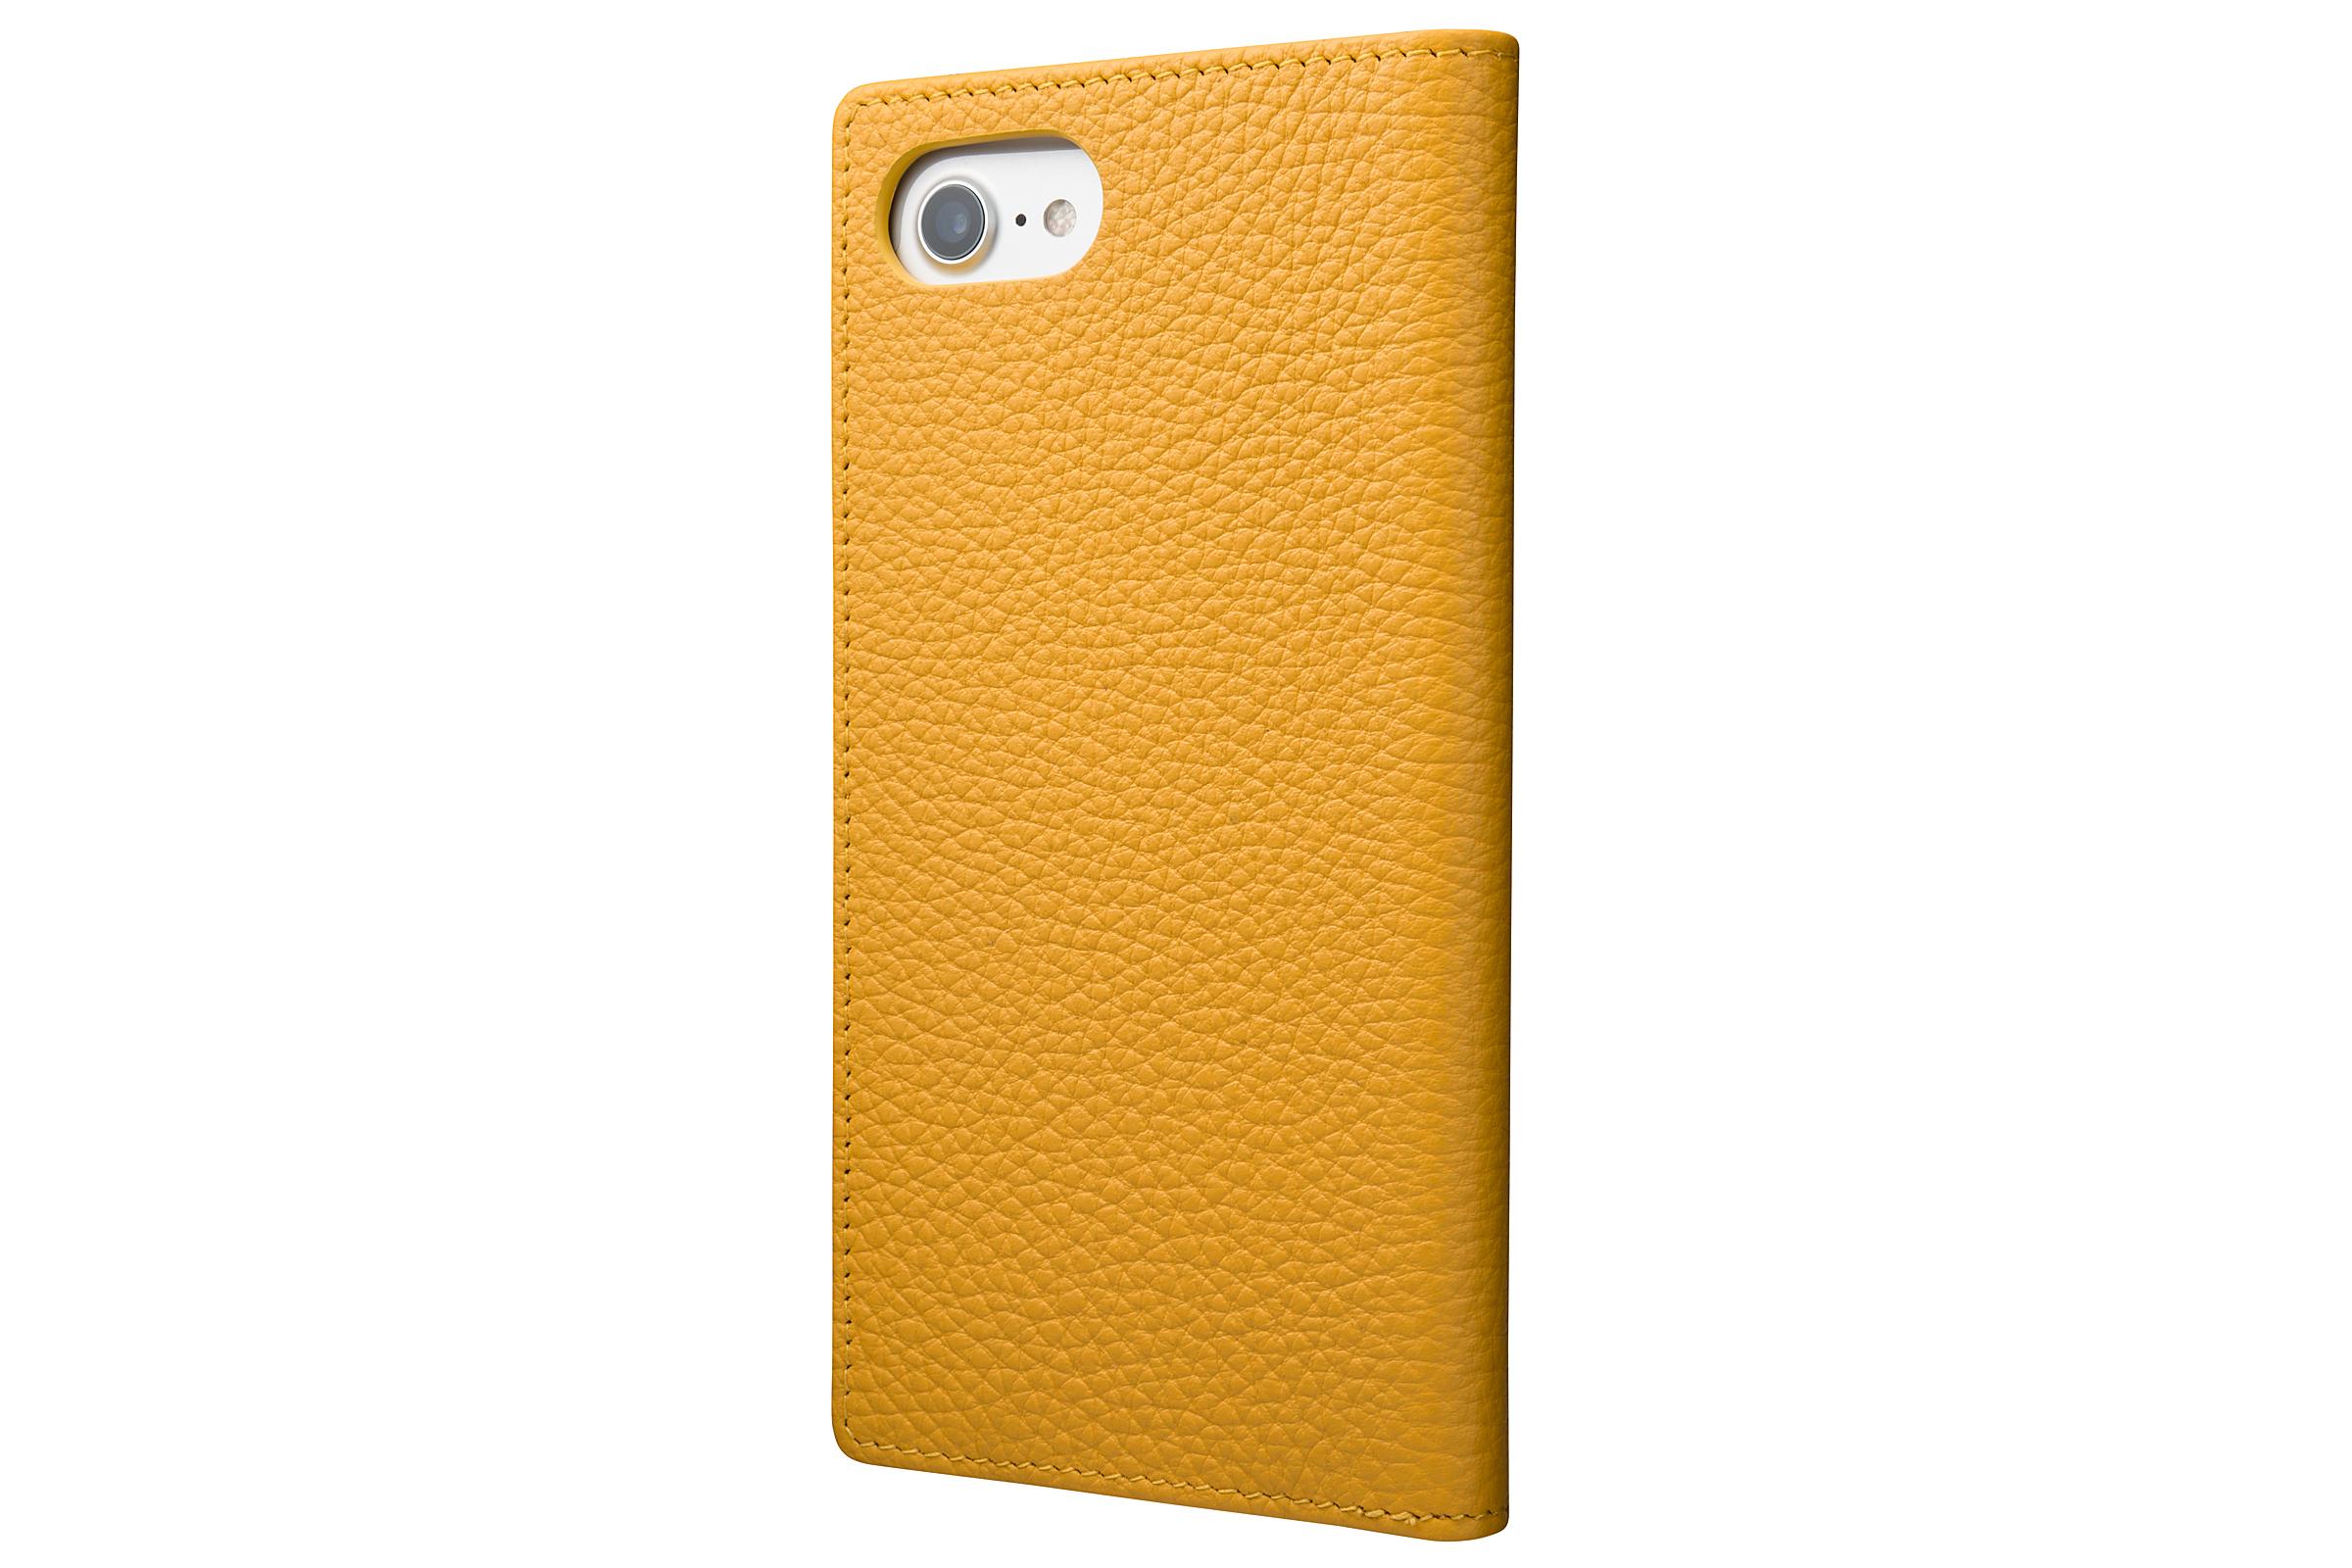 GRAMAS Shrunken-calf Full Leather Case for iPhone 7(Yellow) シュランケンカーフ 手帳型フルレザーケース - 画像2